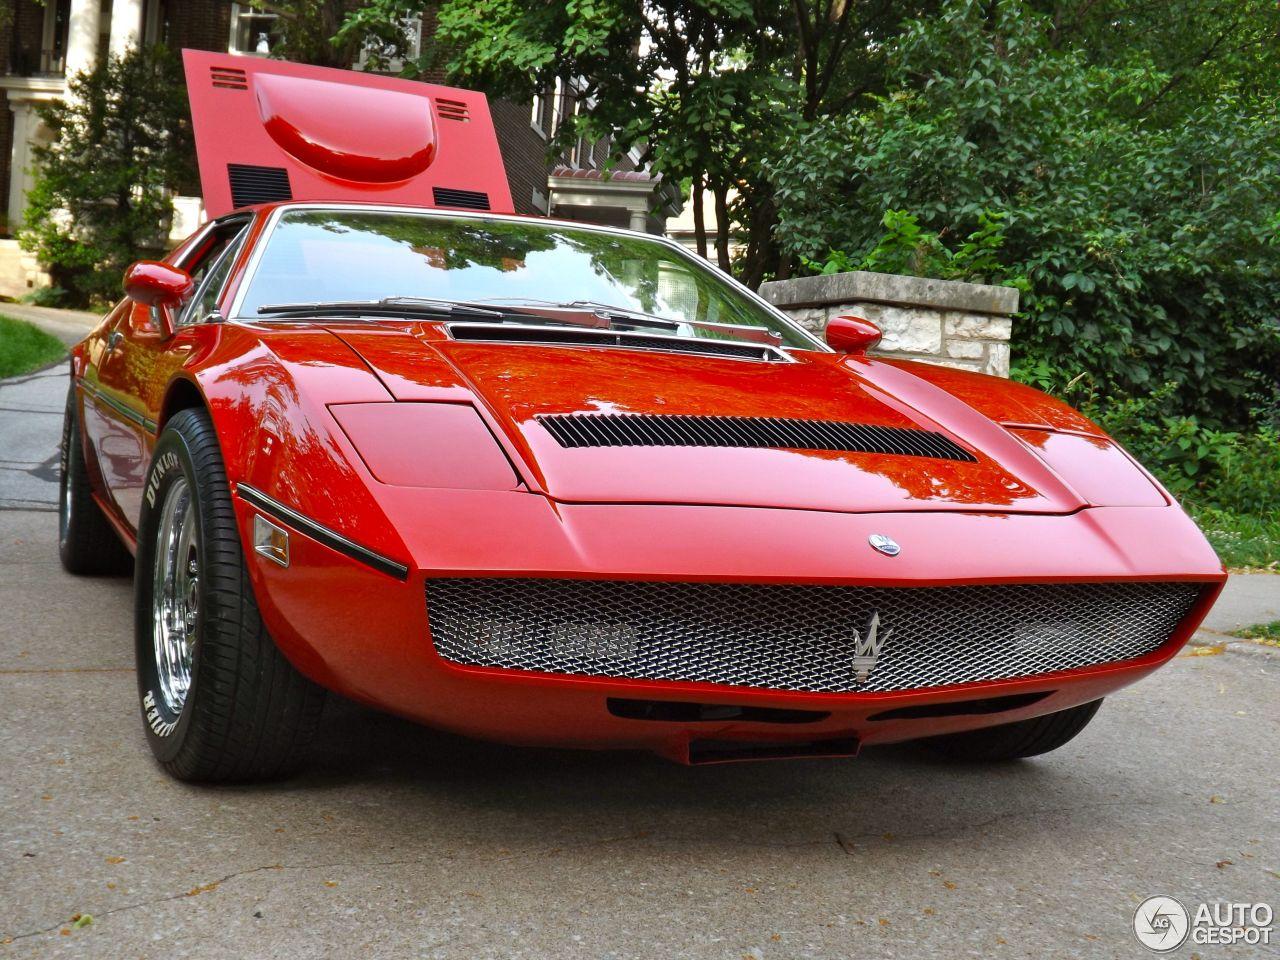 Maserati Merak 24 June 2013 Autogespot